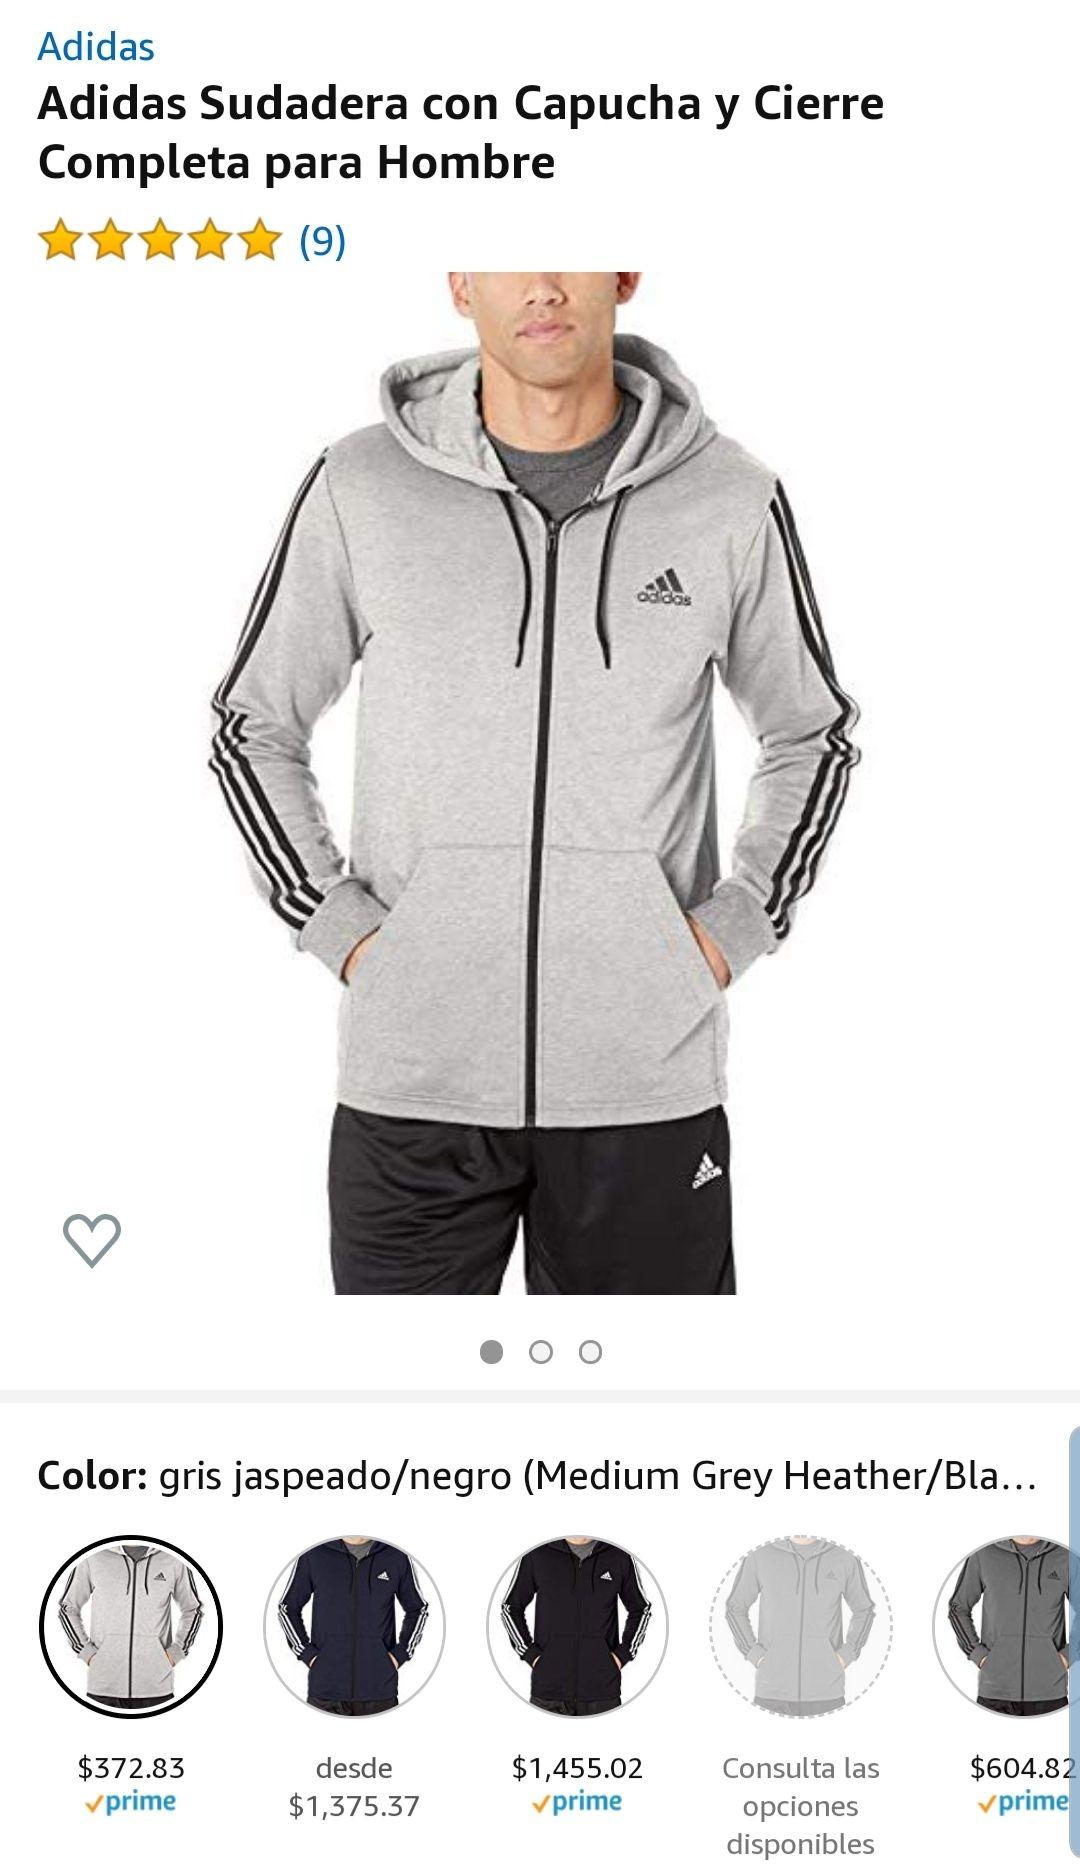 Amazon: $372.83 Talla Larga, Adidas Sudadera para hombre